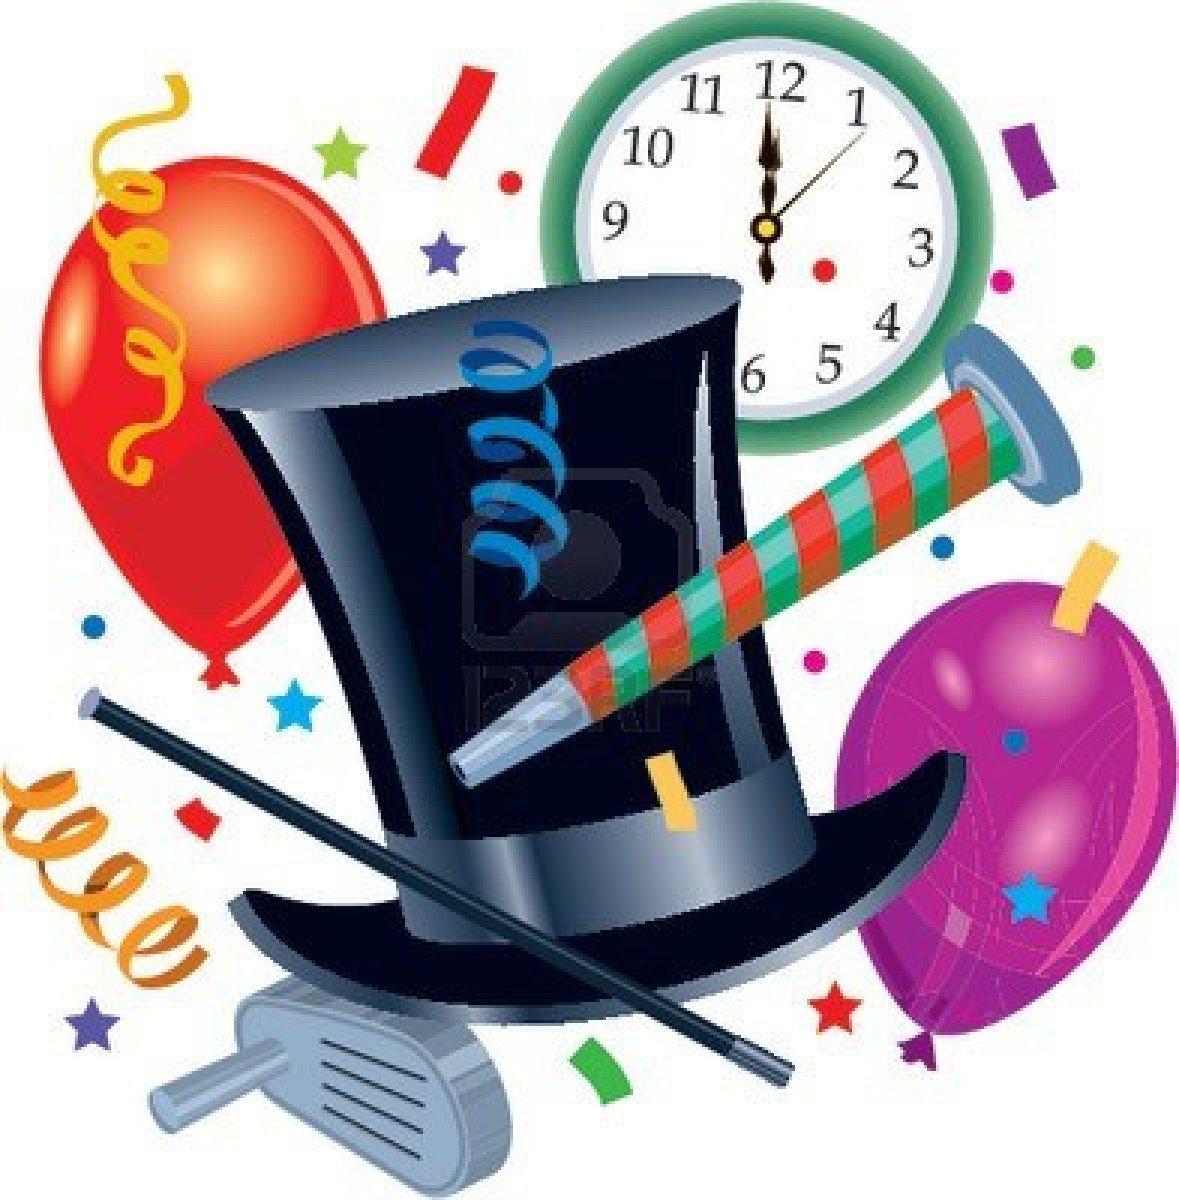 1179x1200 Nye New Year Clip Art Gteomdjnc